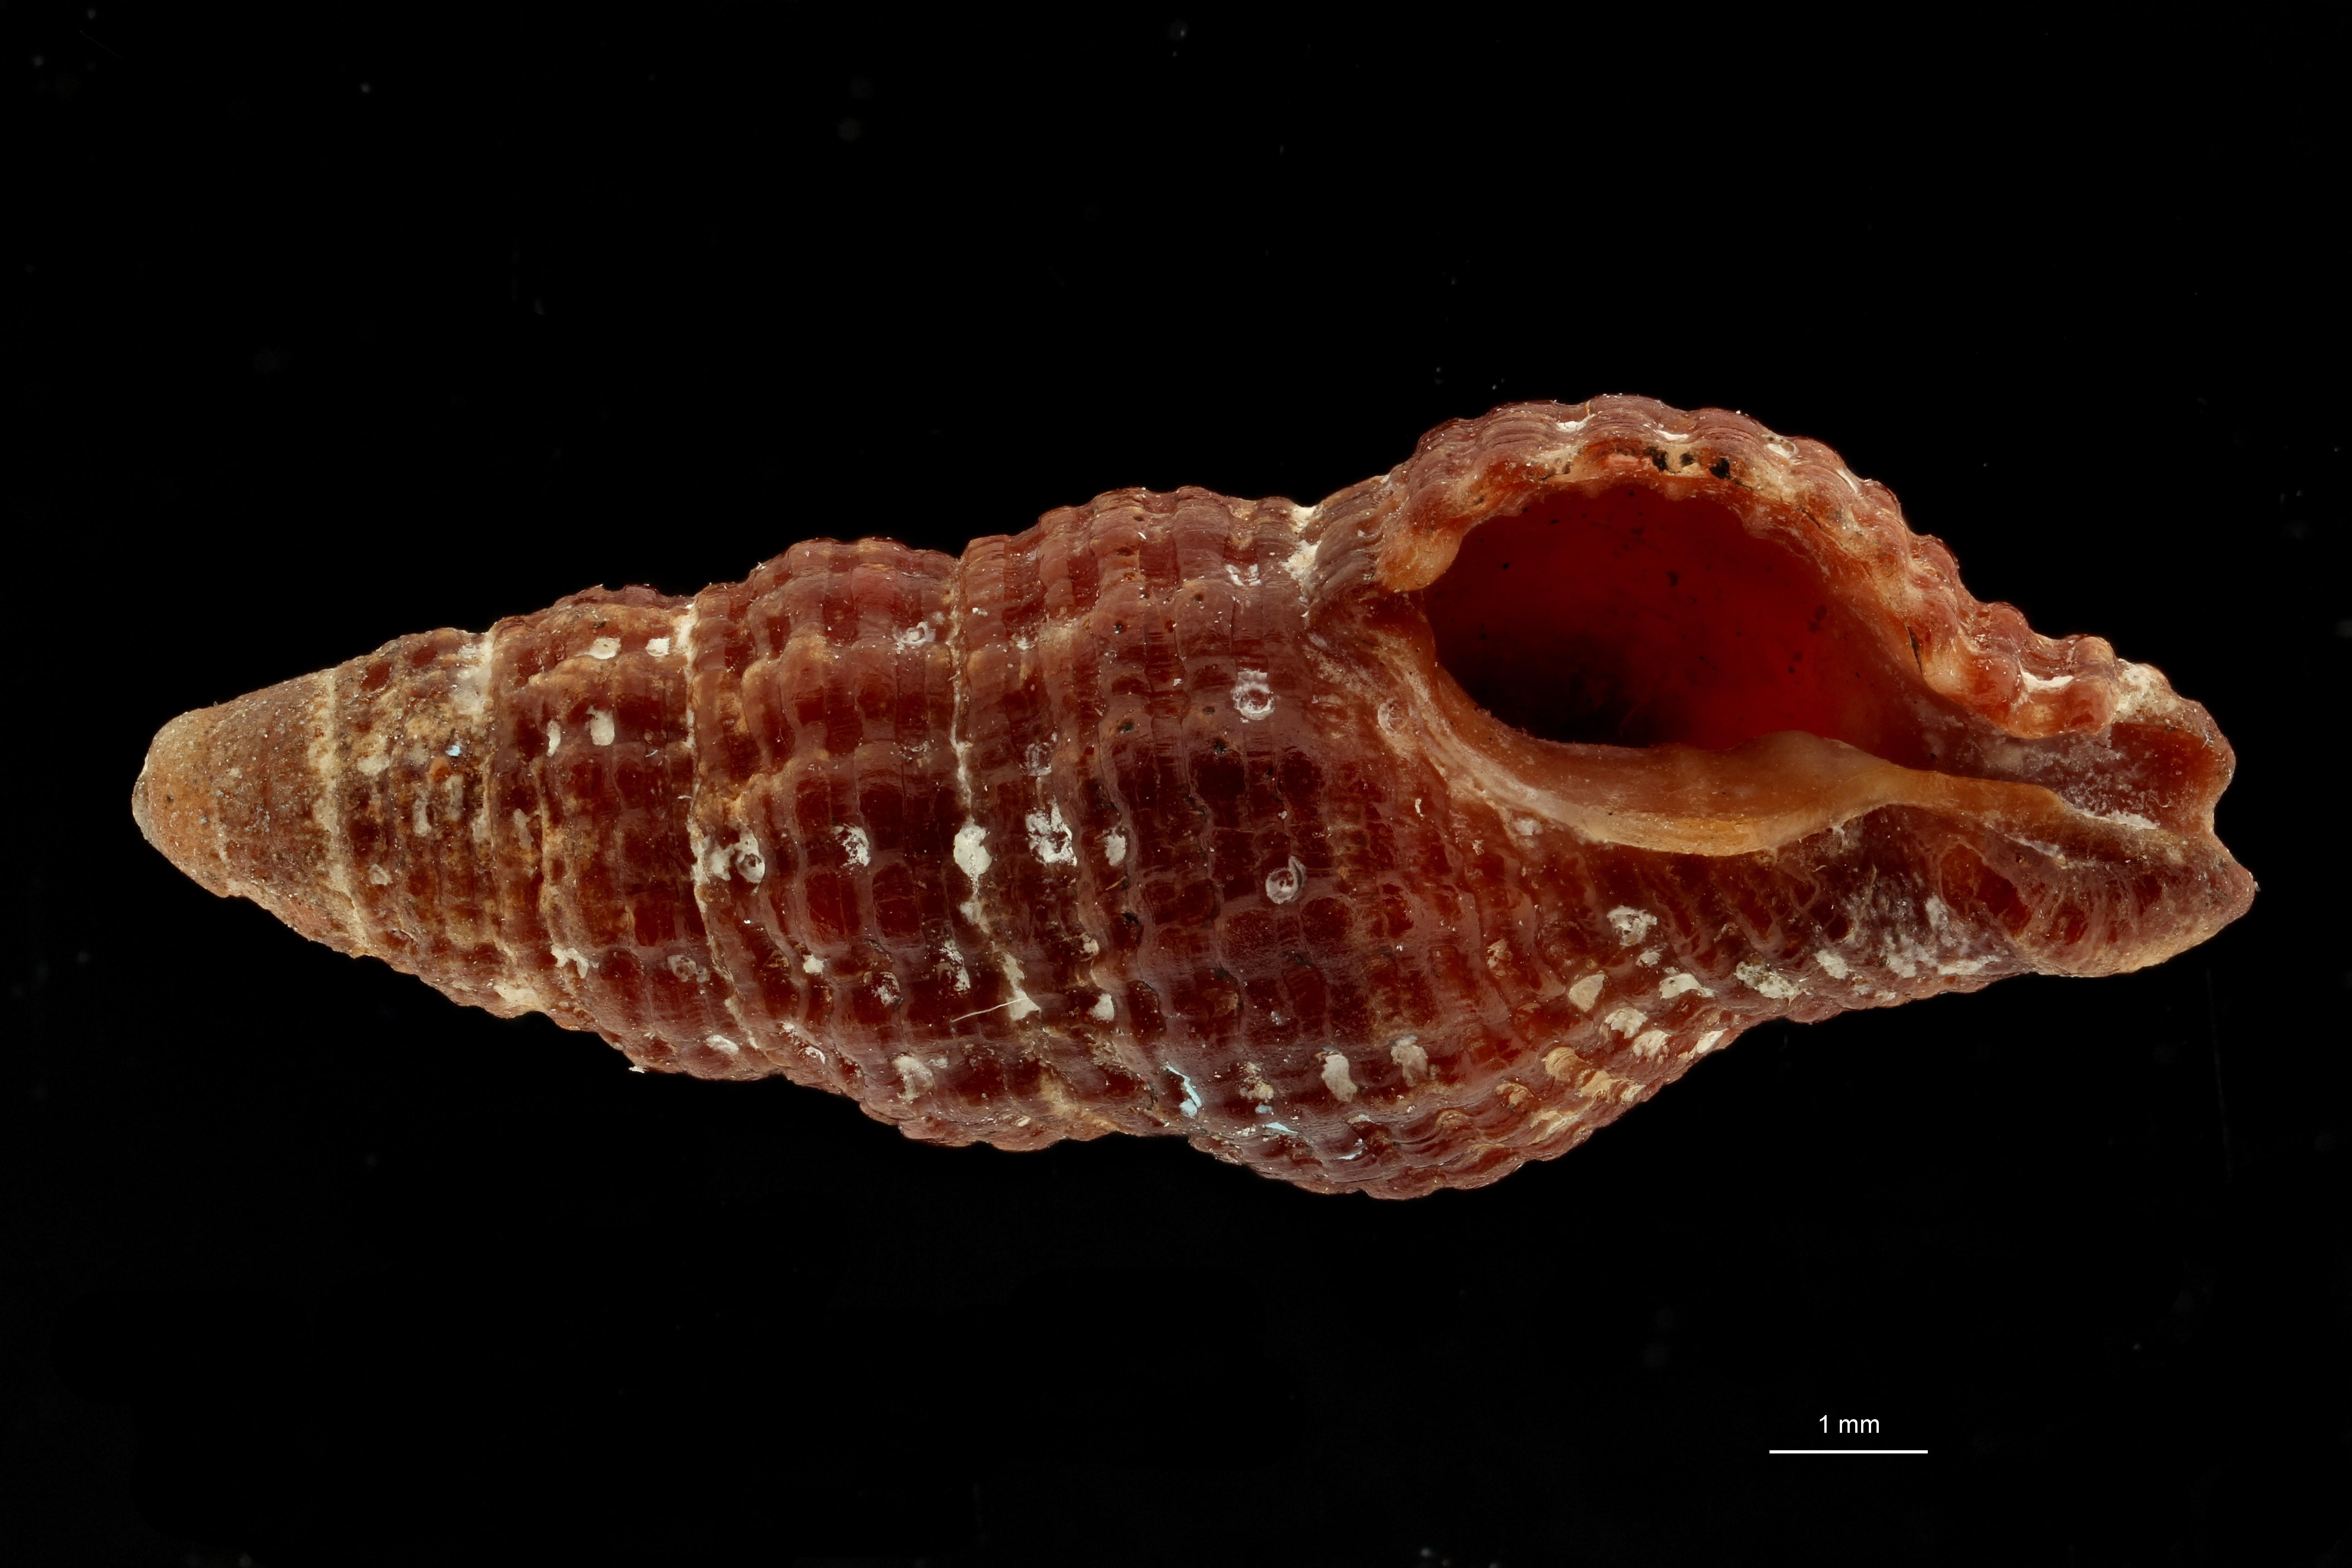 0618 Latirus funebris Typ V ZS PMax Scaled.jpg